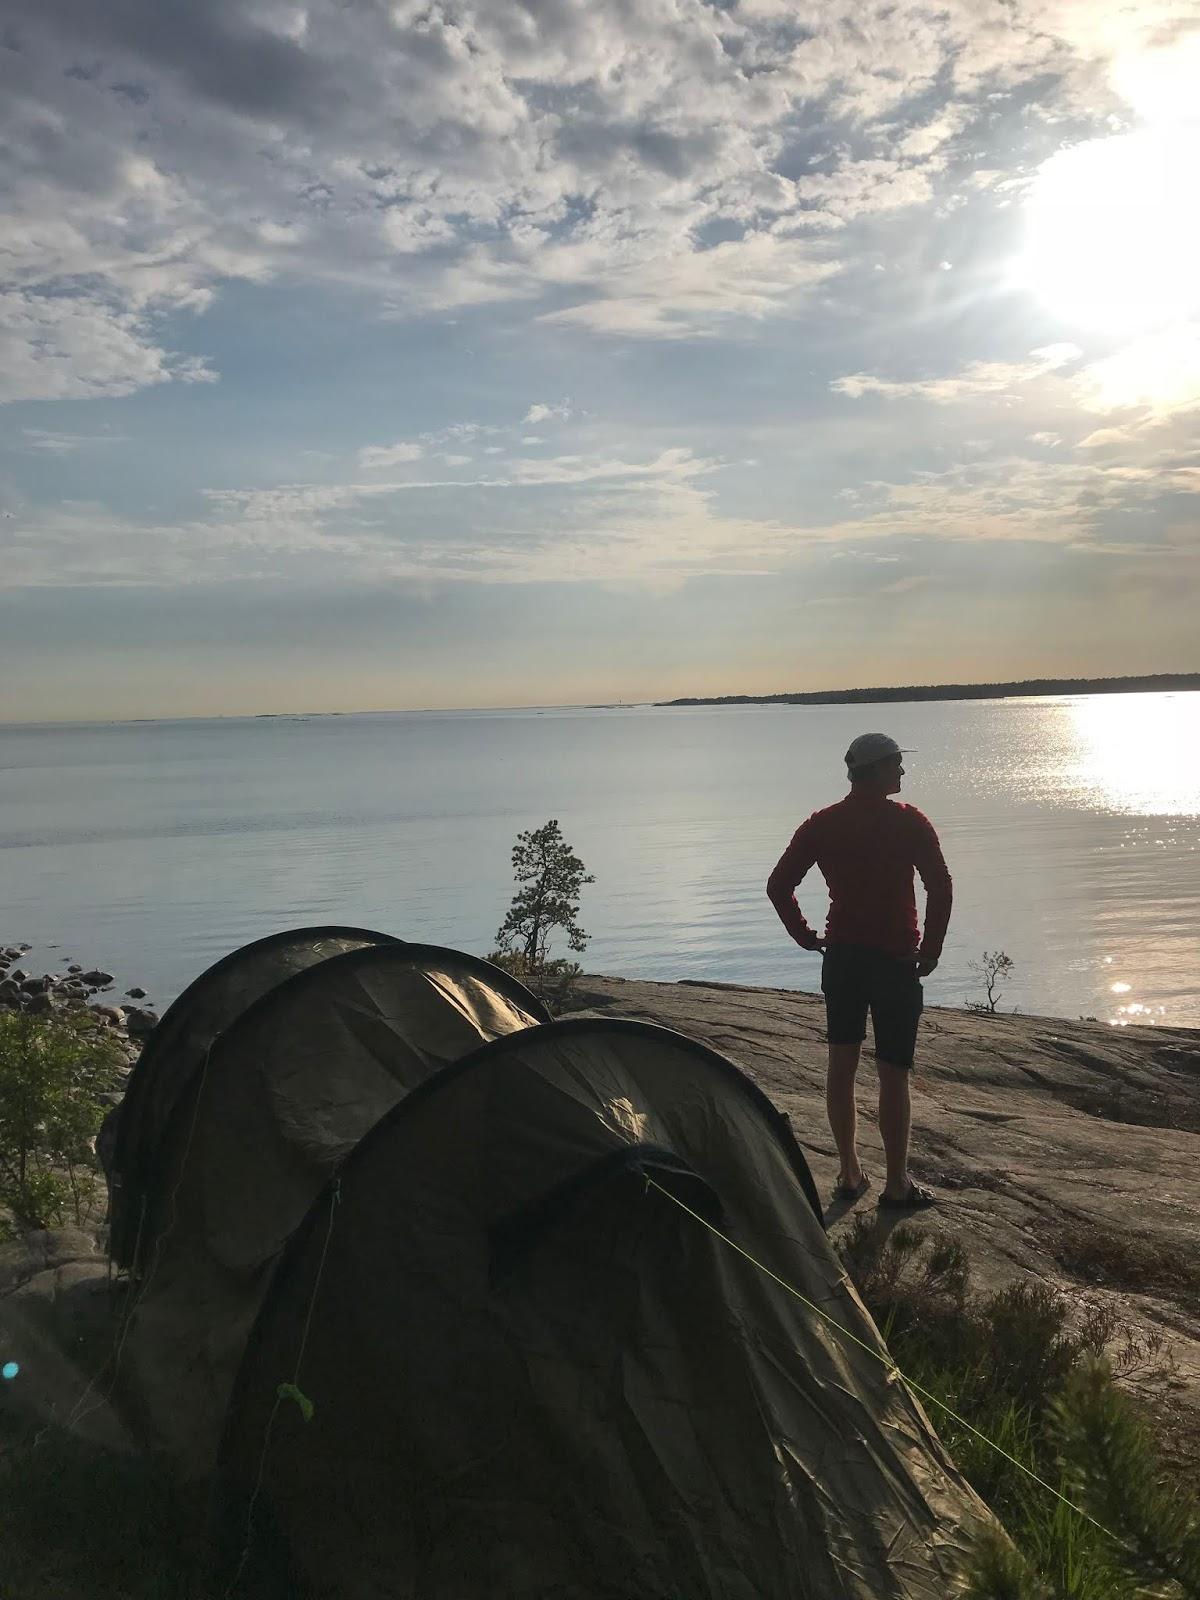 Koukku johtaa Camping